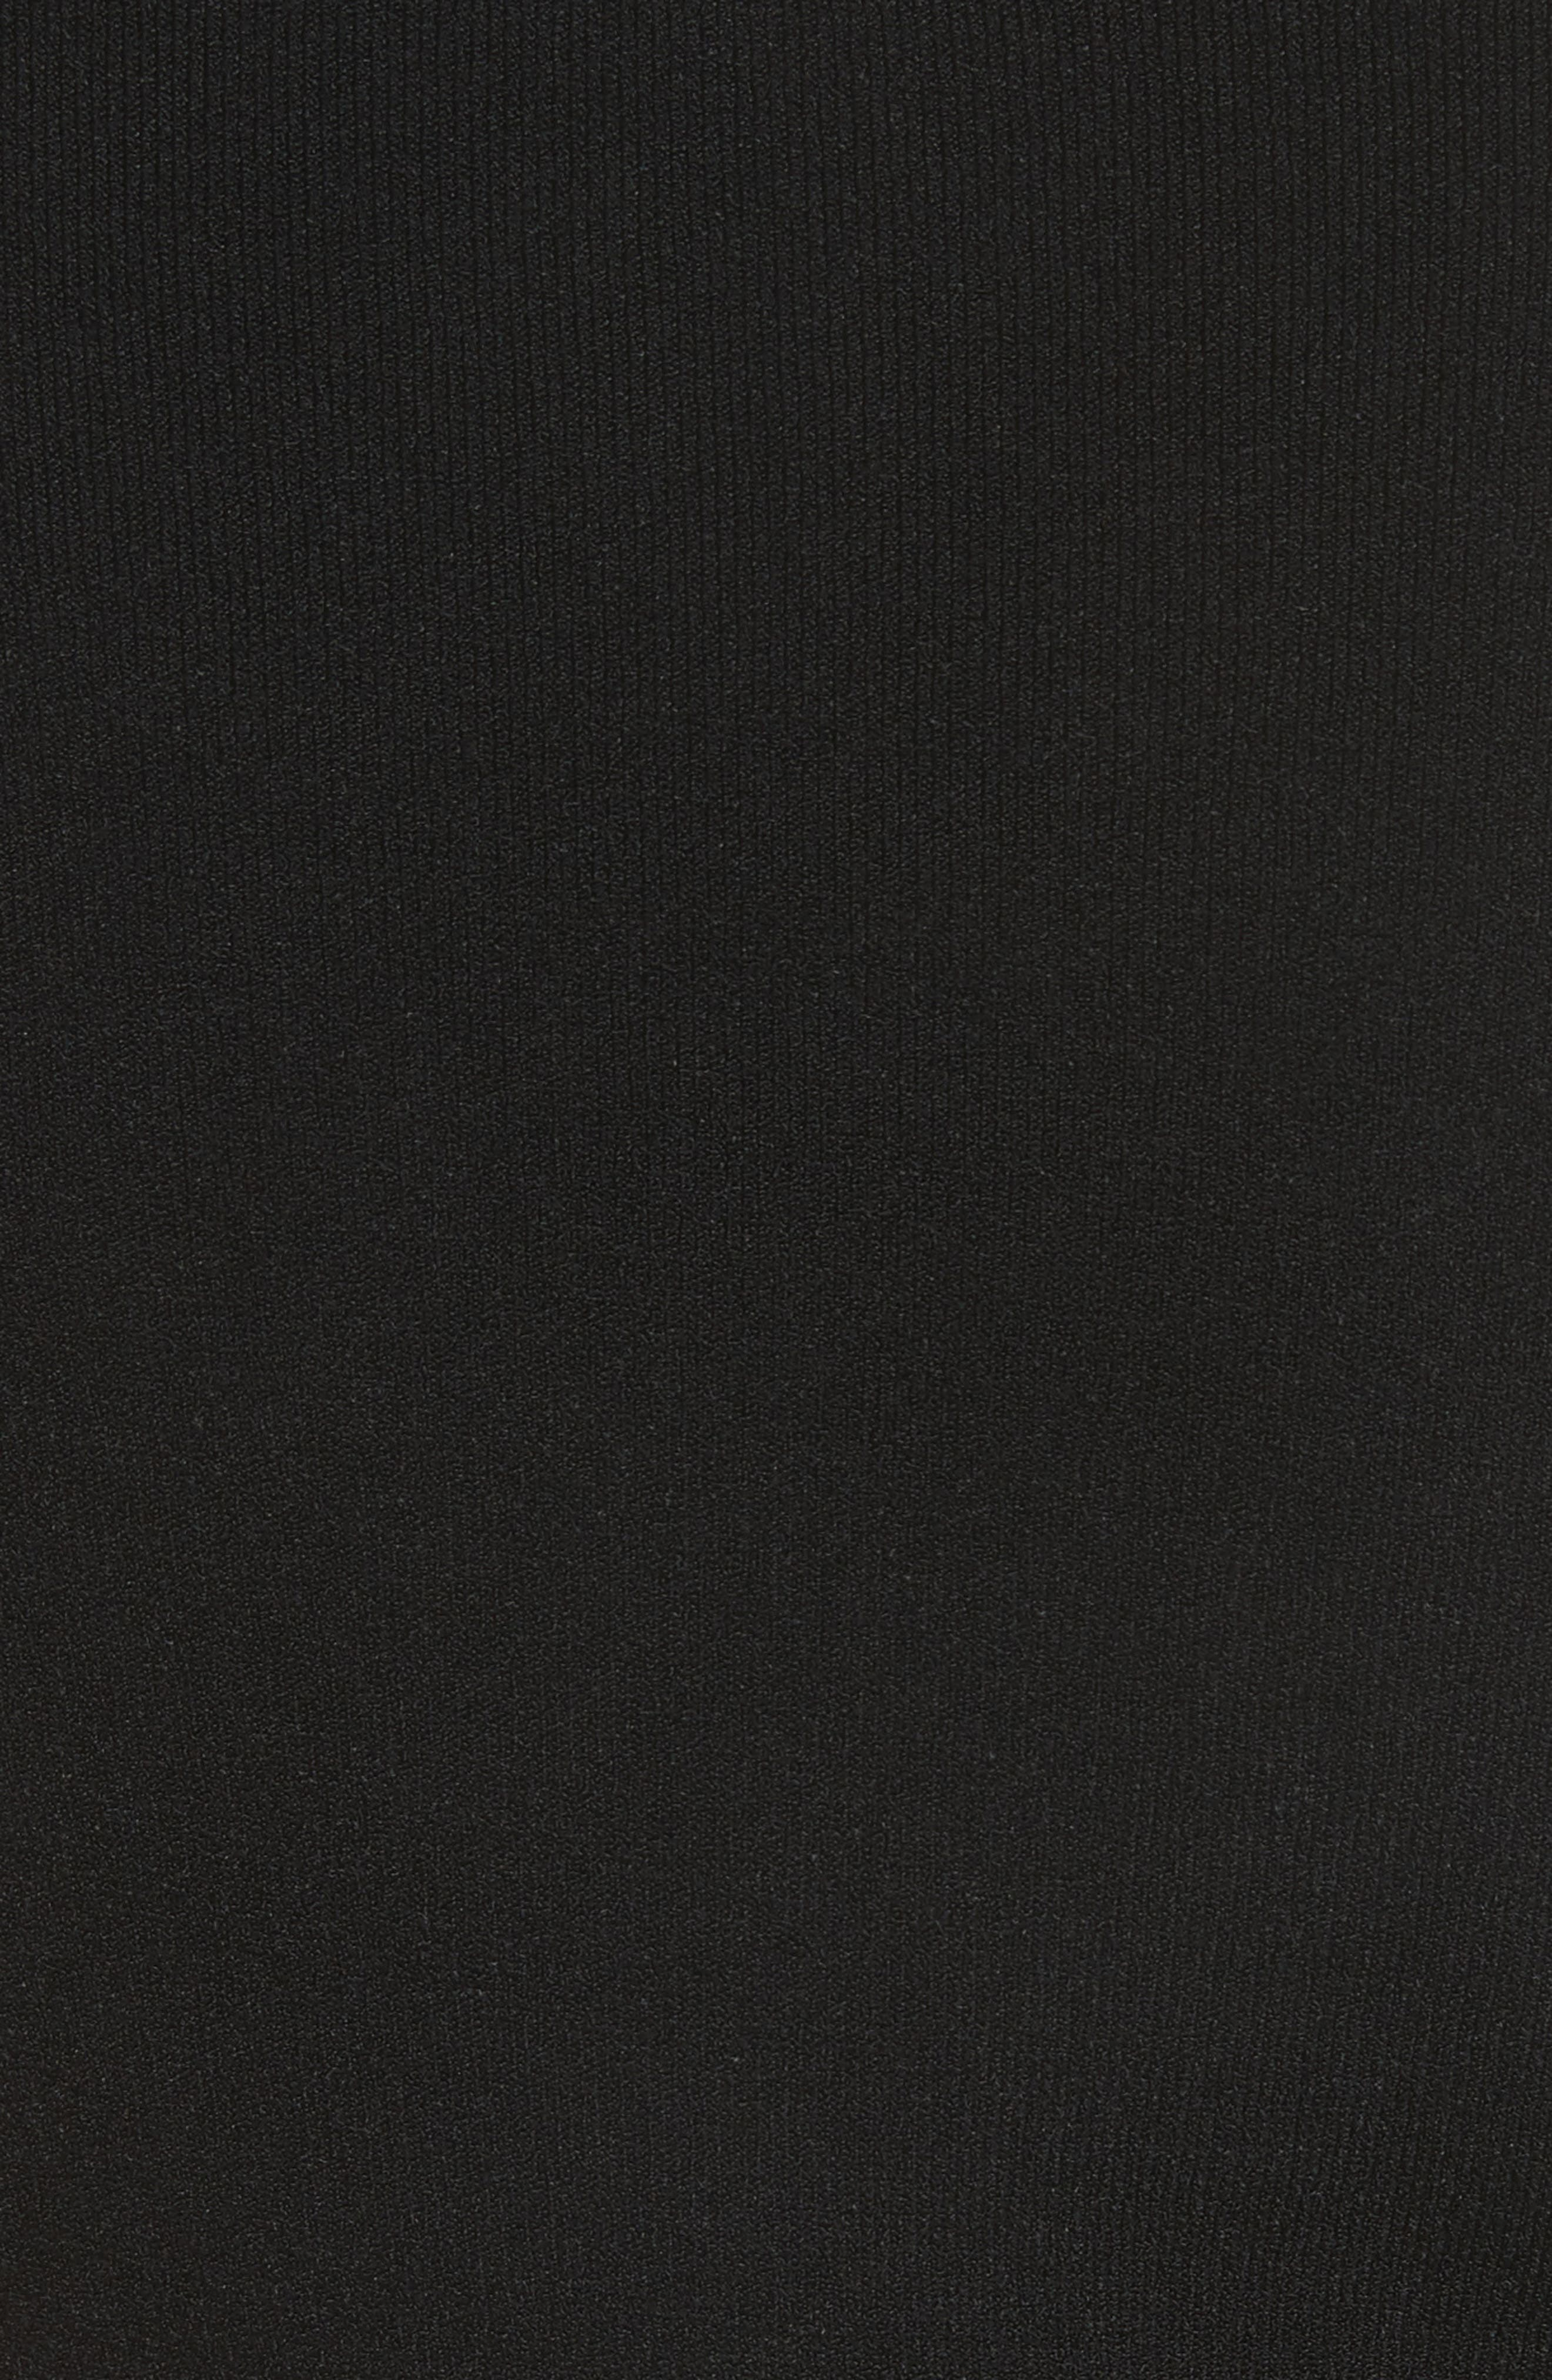 Ruched Midi Dress,                             Alternate thumbnail 5, color,                             001